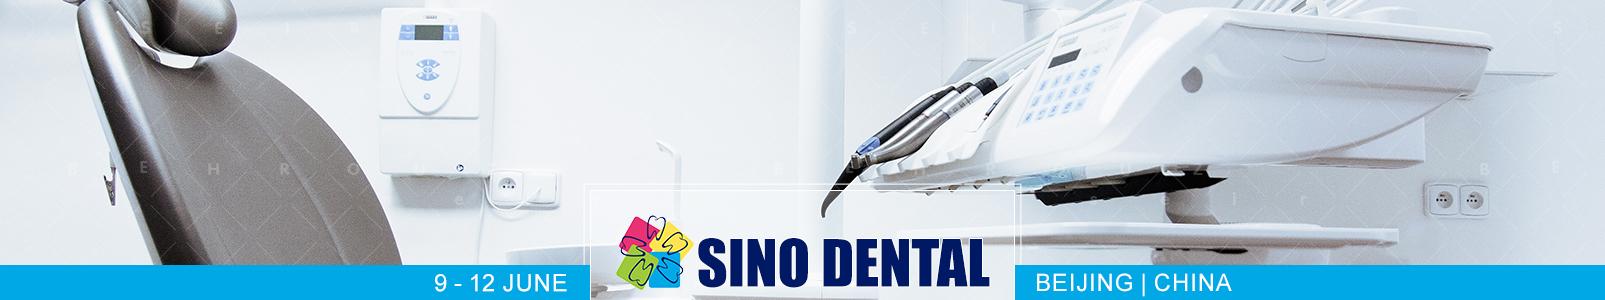 Sino-Dental-Header-بهروزسیر